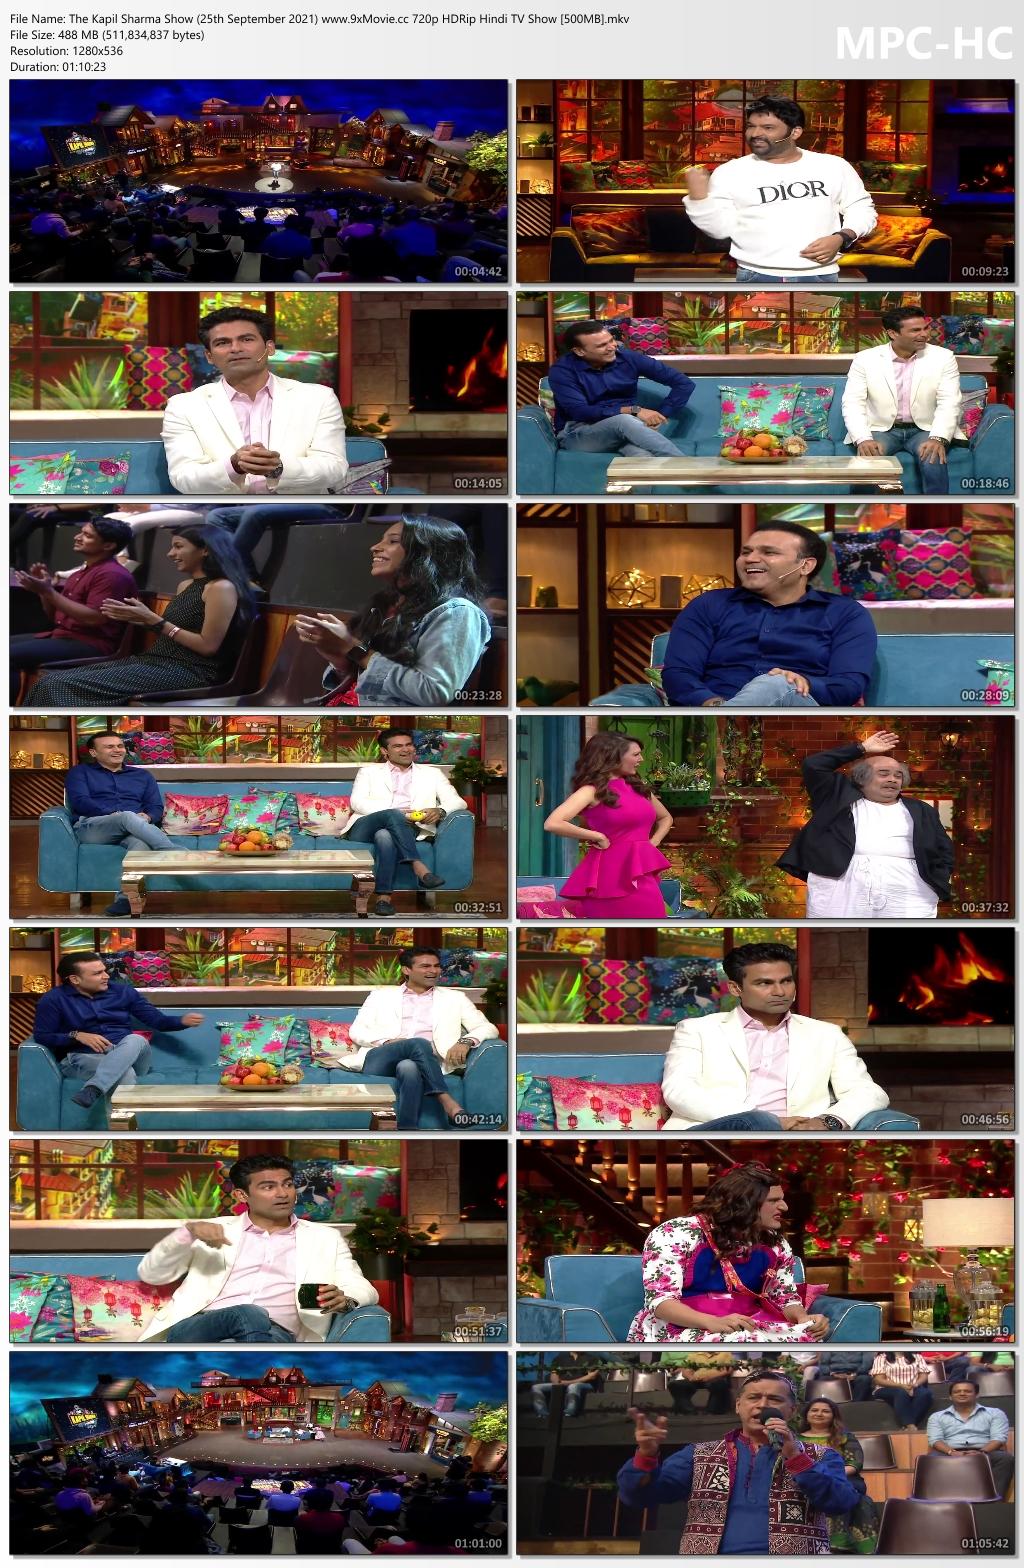 The-Kapil-Sharma-Show-25th-September-2021-www-9x-Movie-cc-720p-HDRip-Hindi-TV-Show-500-MB-mkv